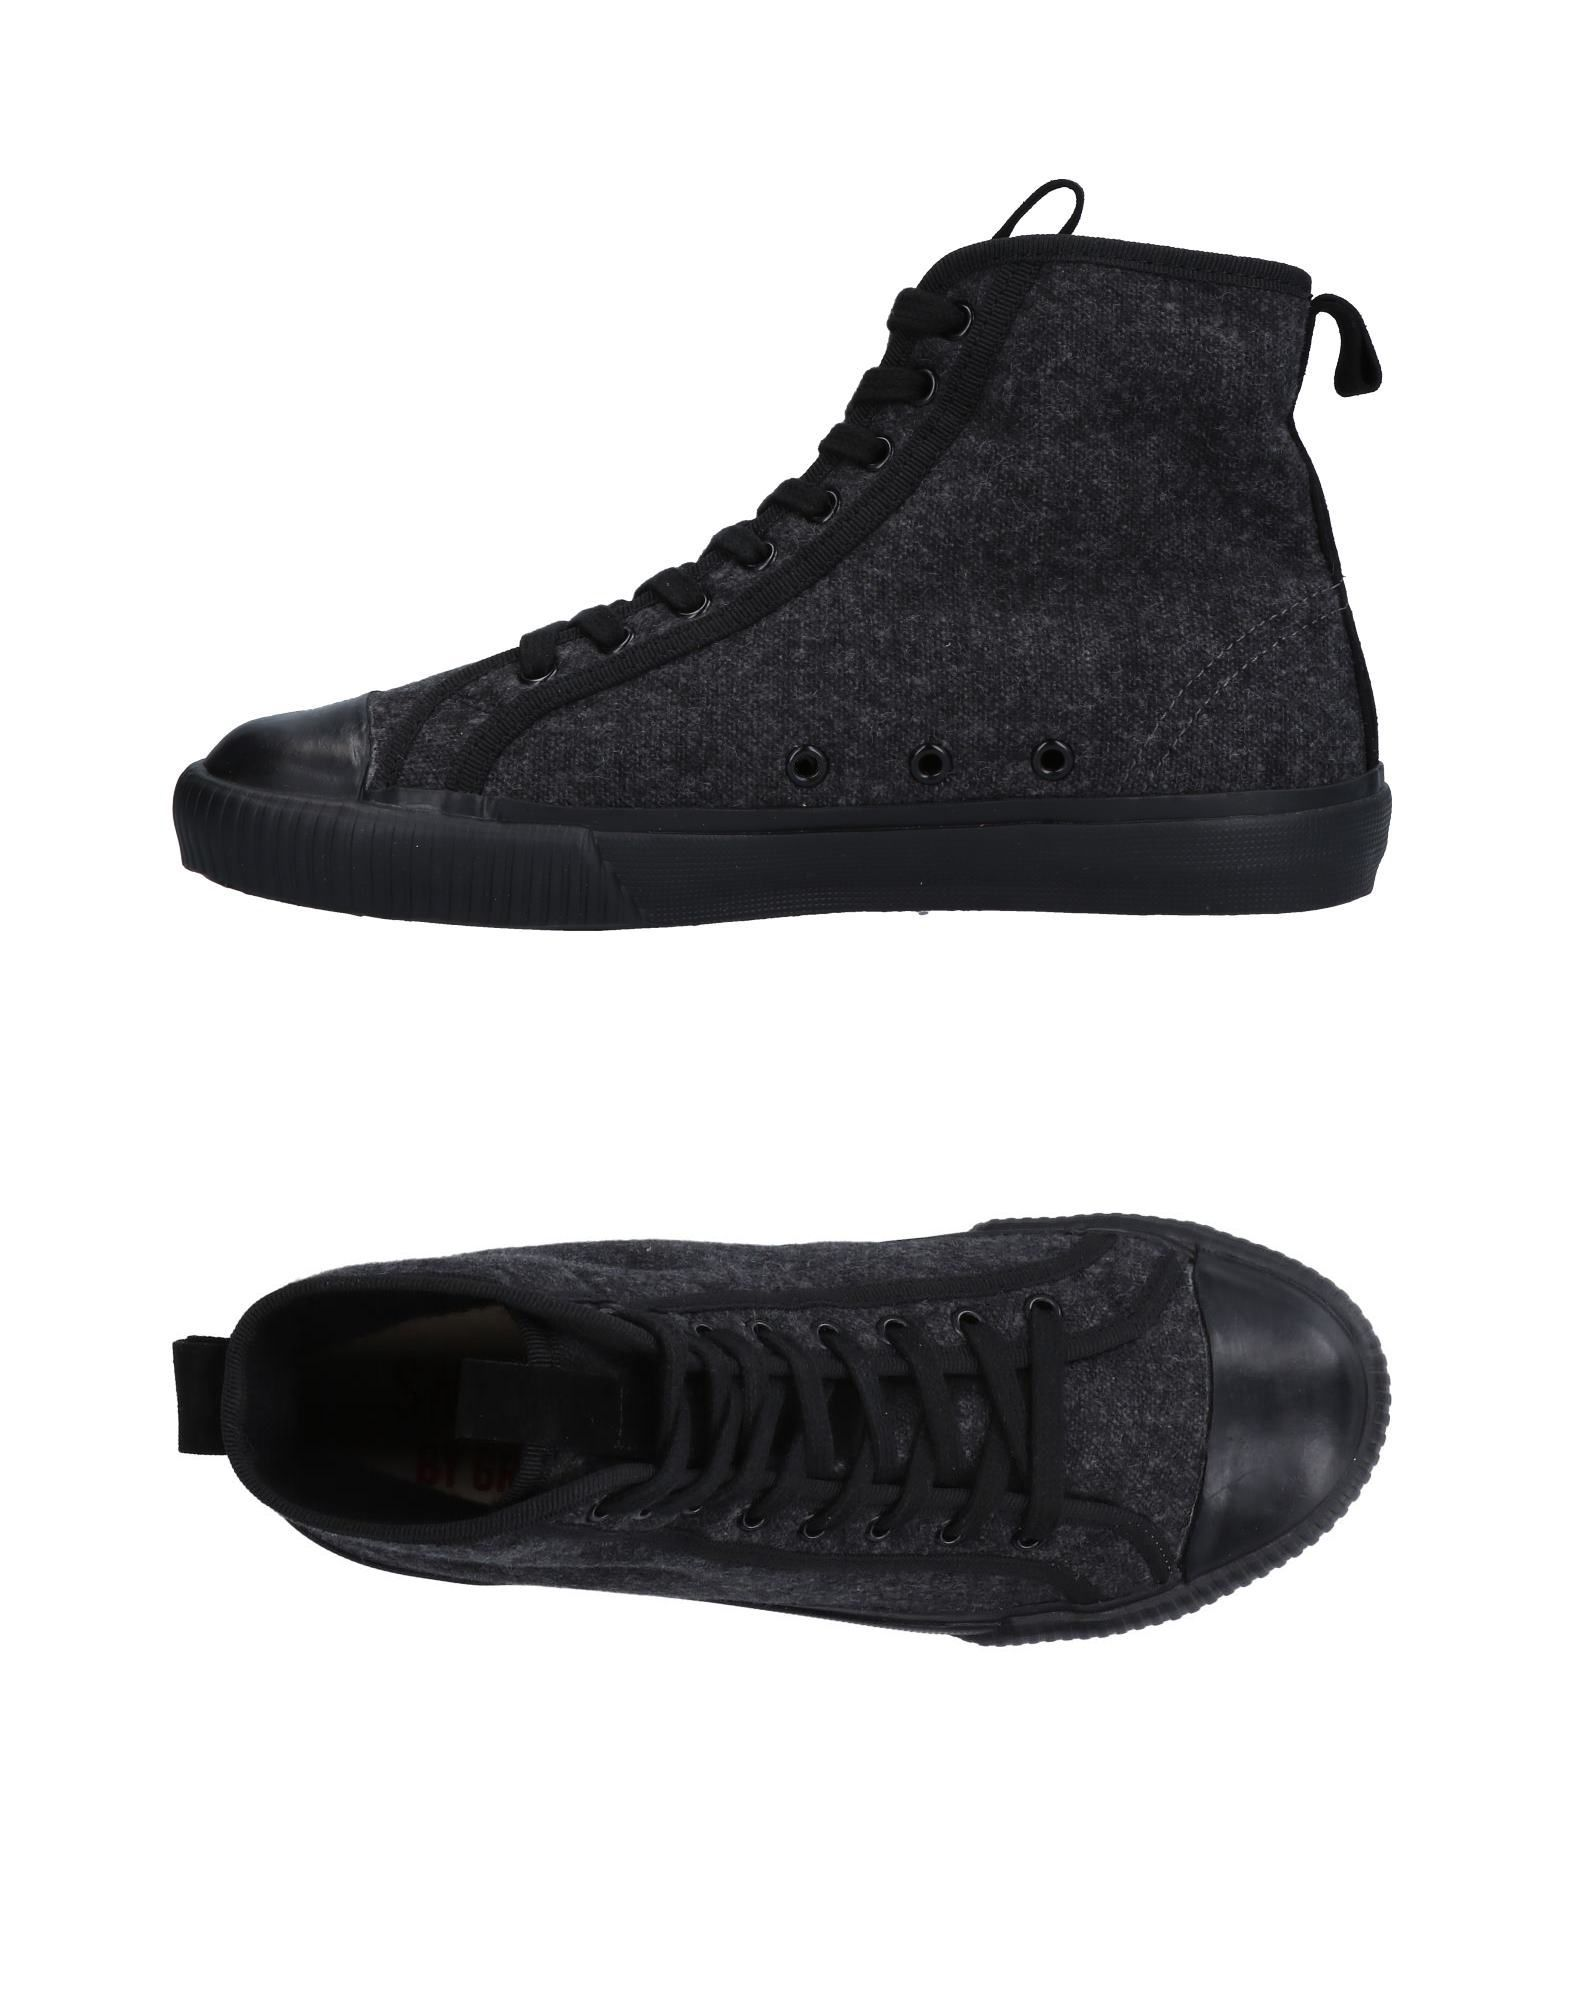 Grenson  Sneakers Damen  11506928TI  Grenson cf2026